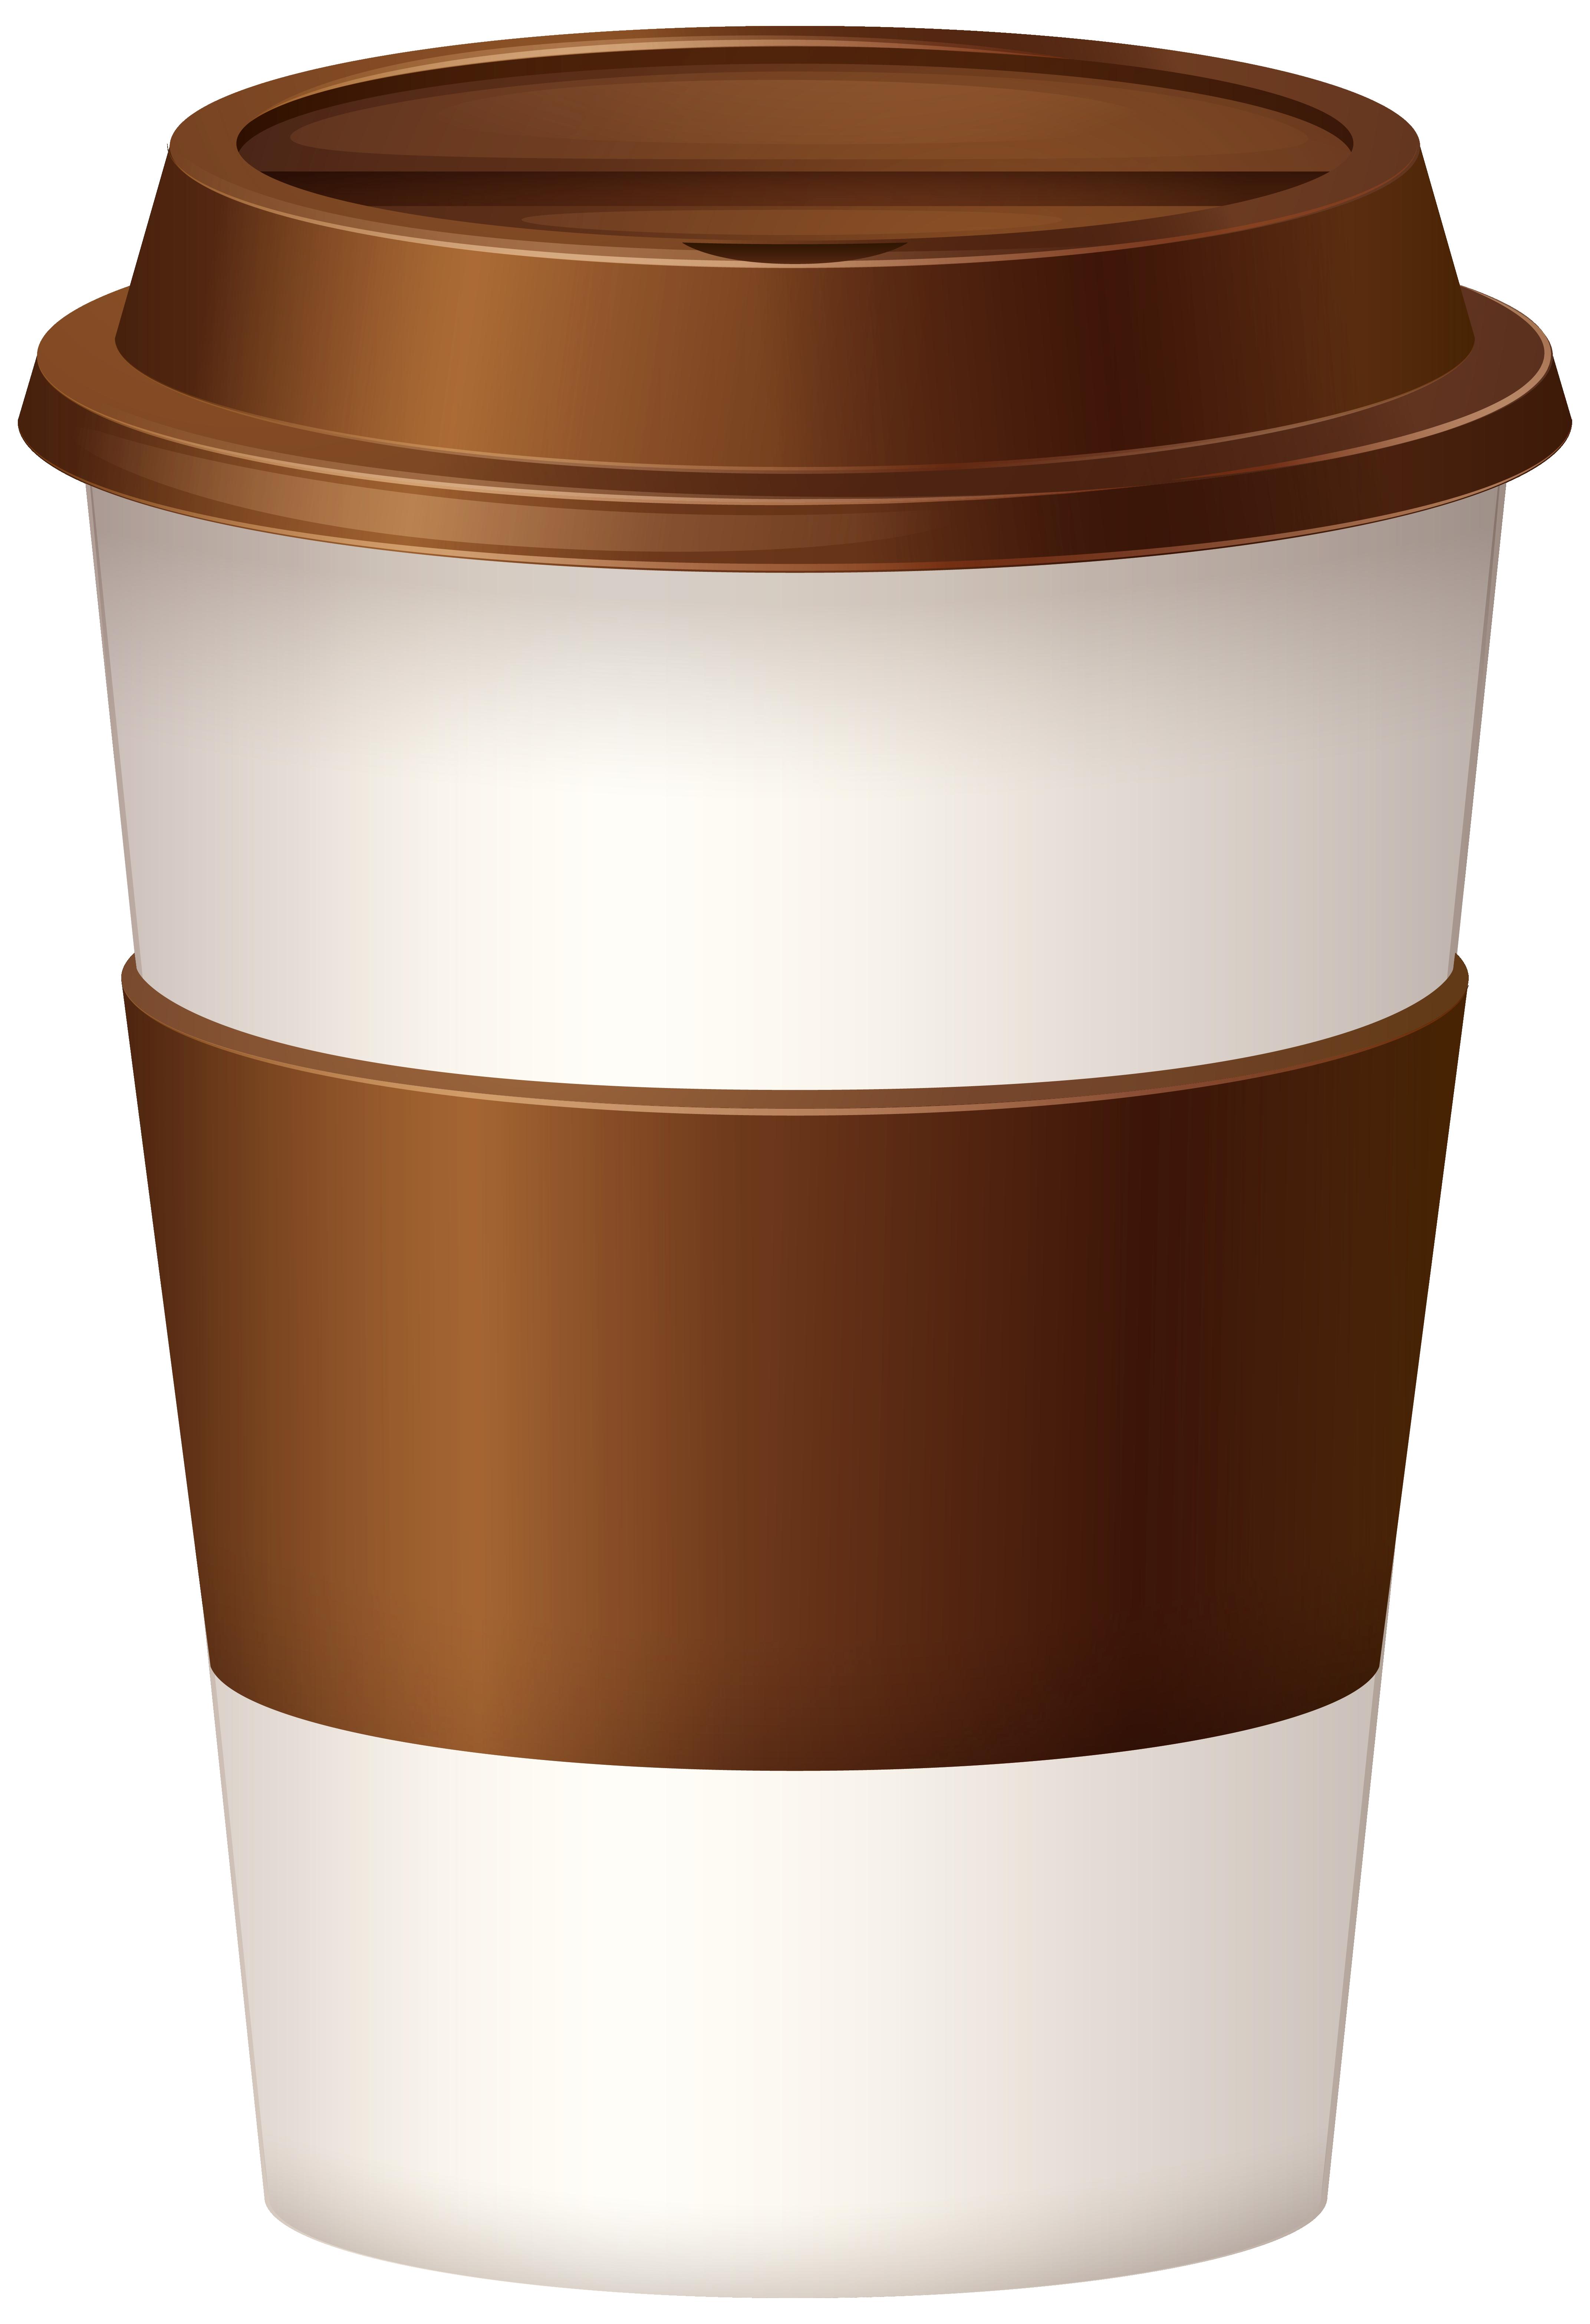 Mug clipart plastic mug. Hot coffee cup png